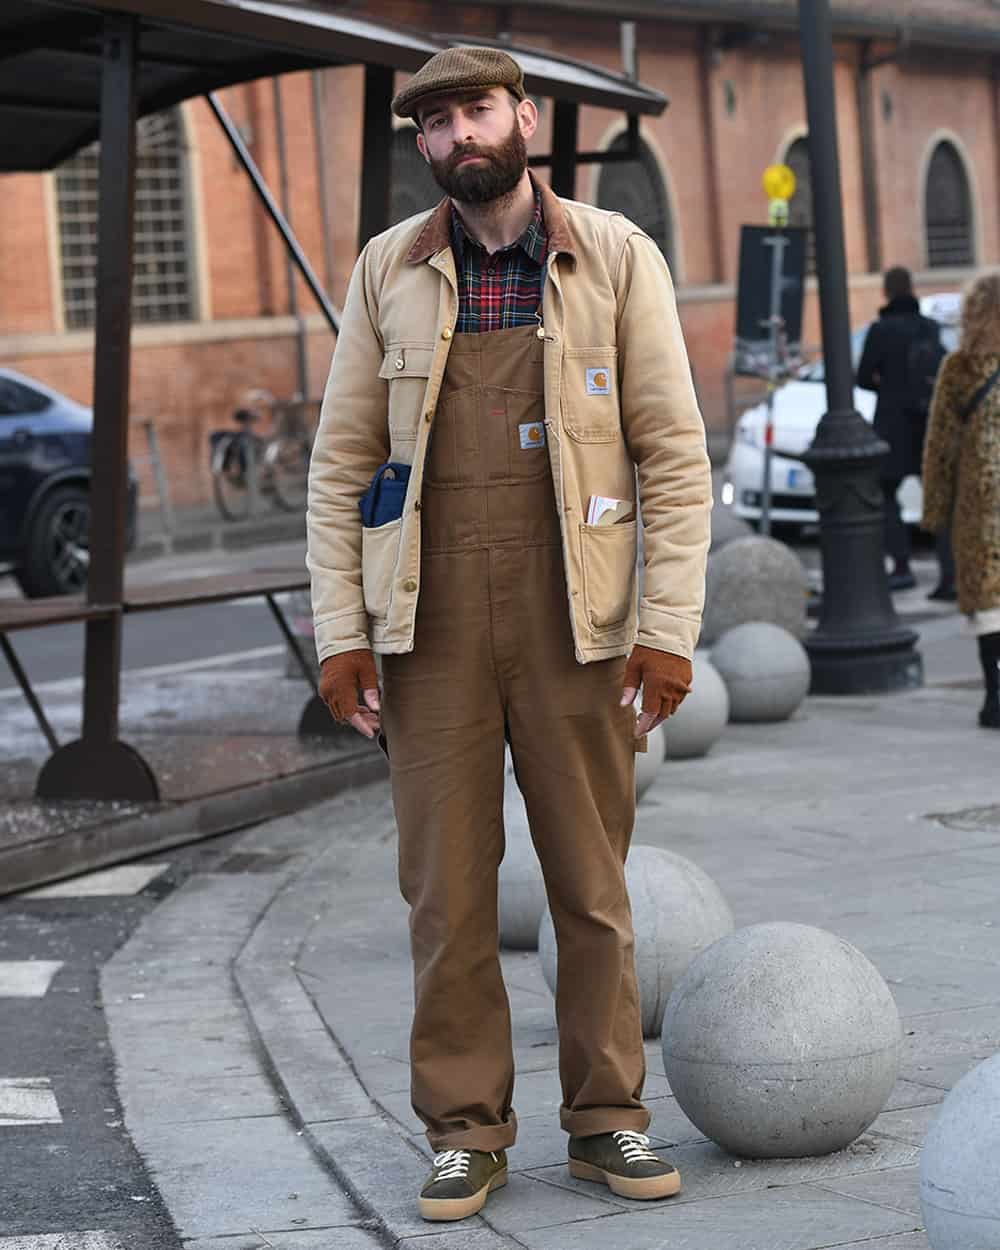 Street Style at Pitti Immagine Uomo